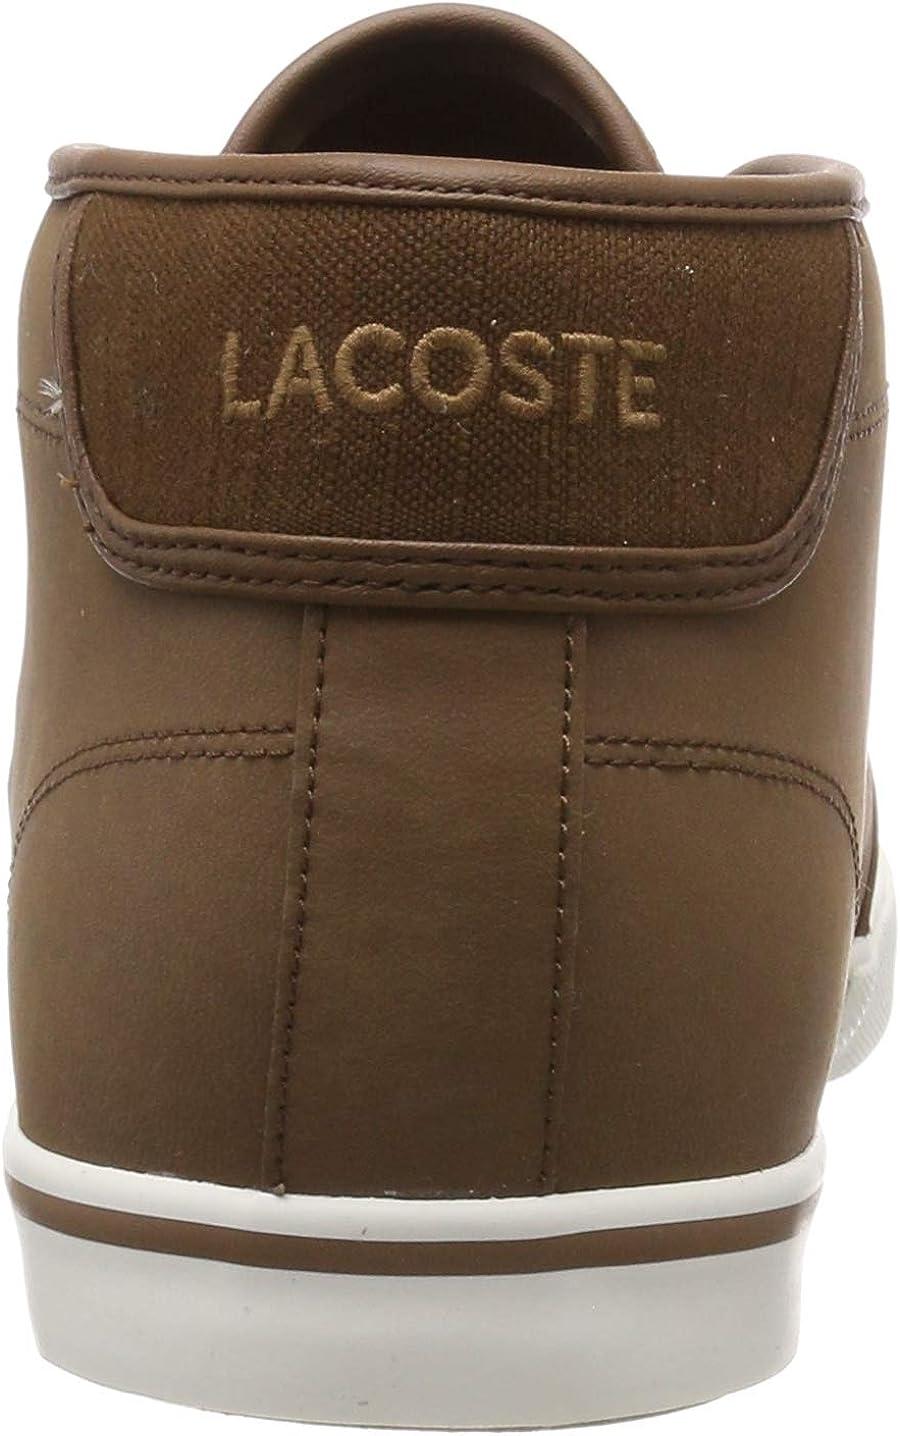 Lacoste Ampthill 119 1 CMA, Zapatillas Altas para Hombre: Amazon ...